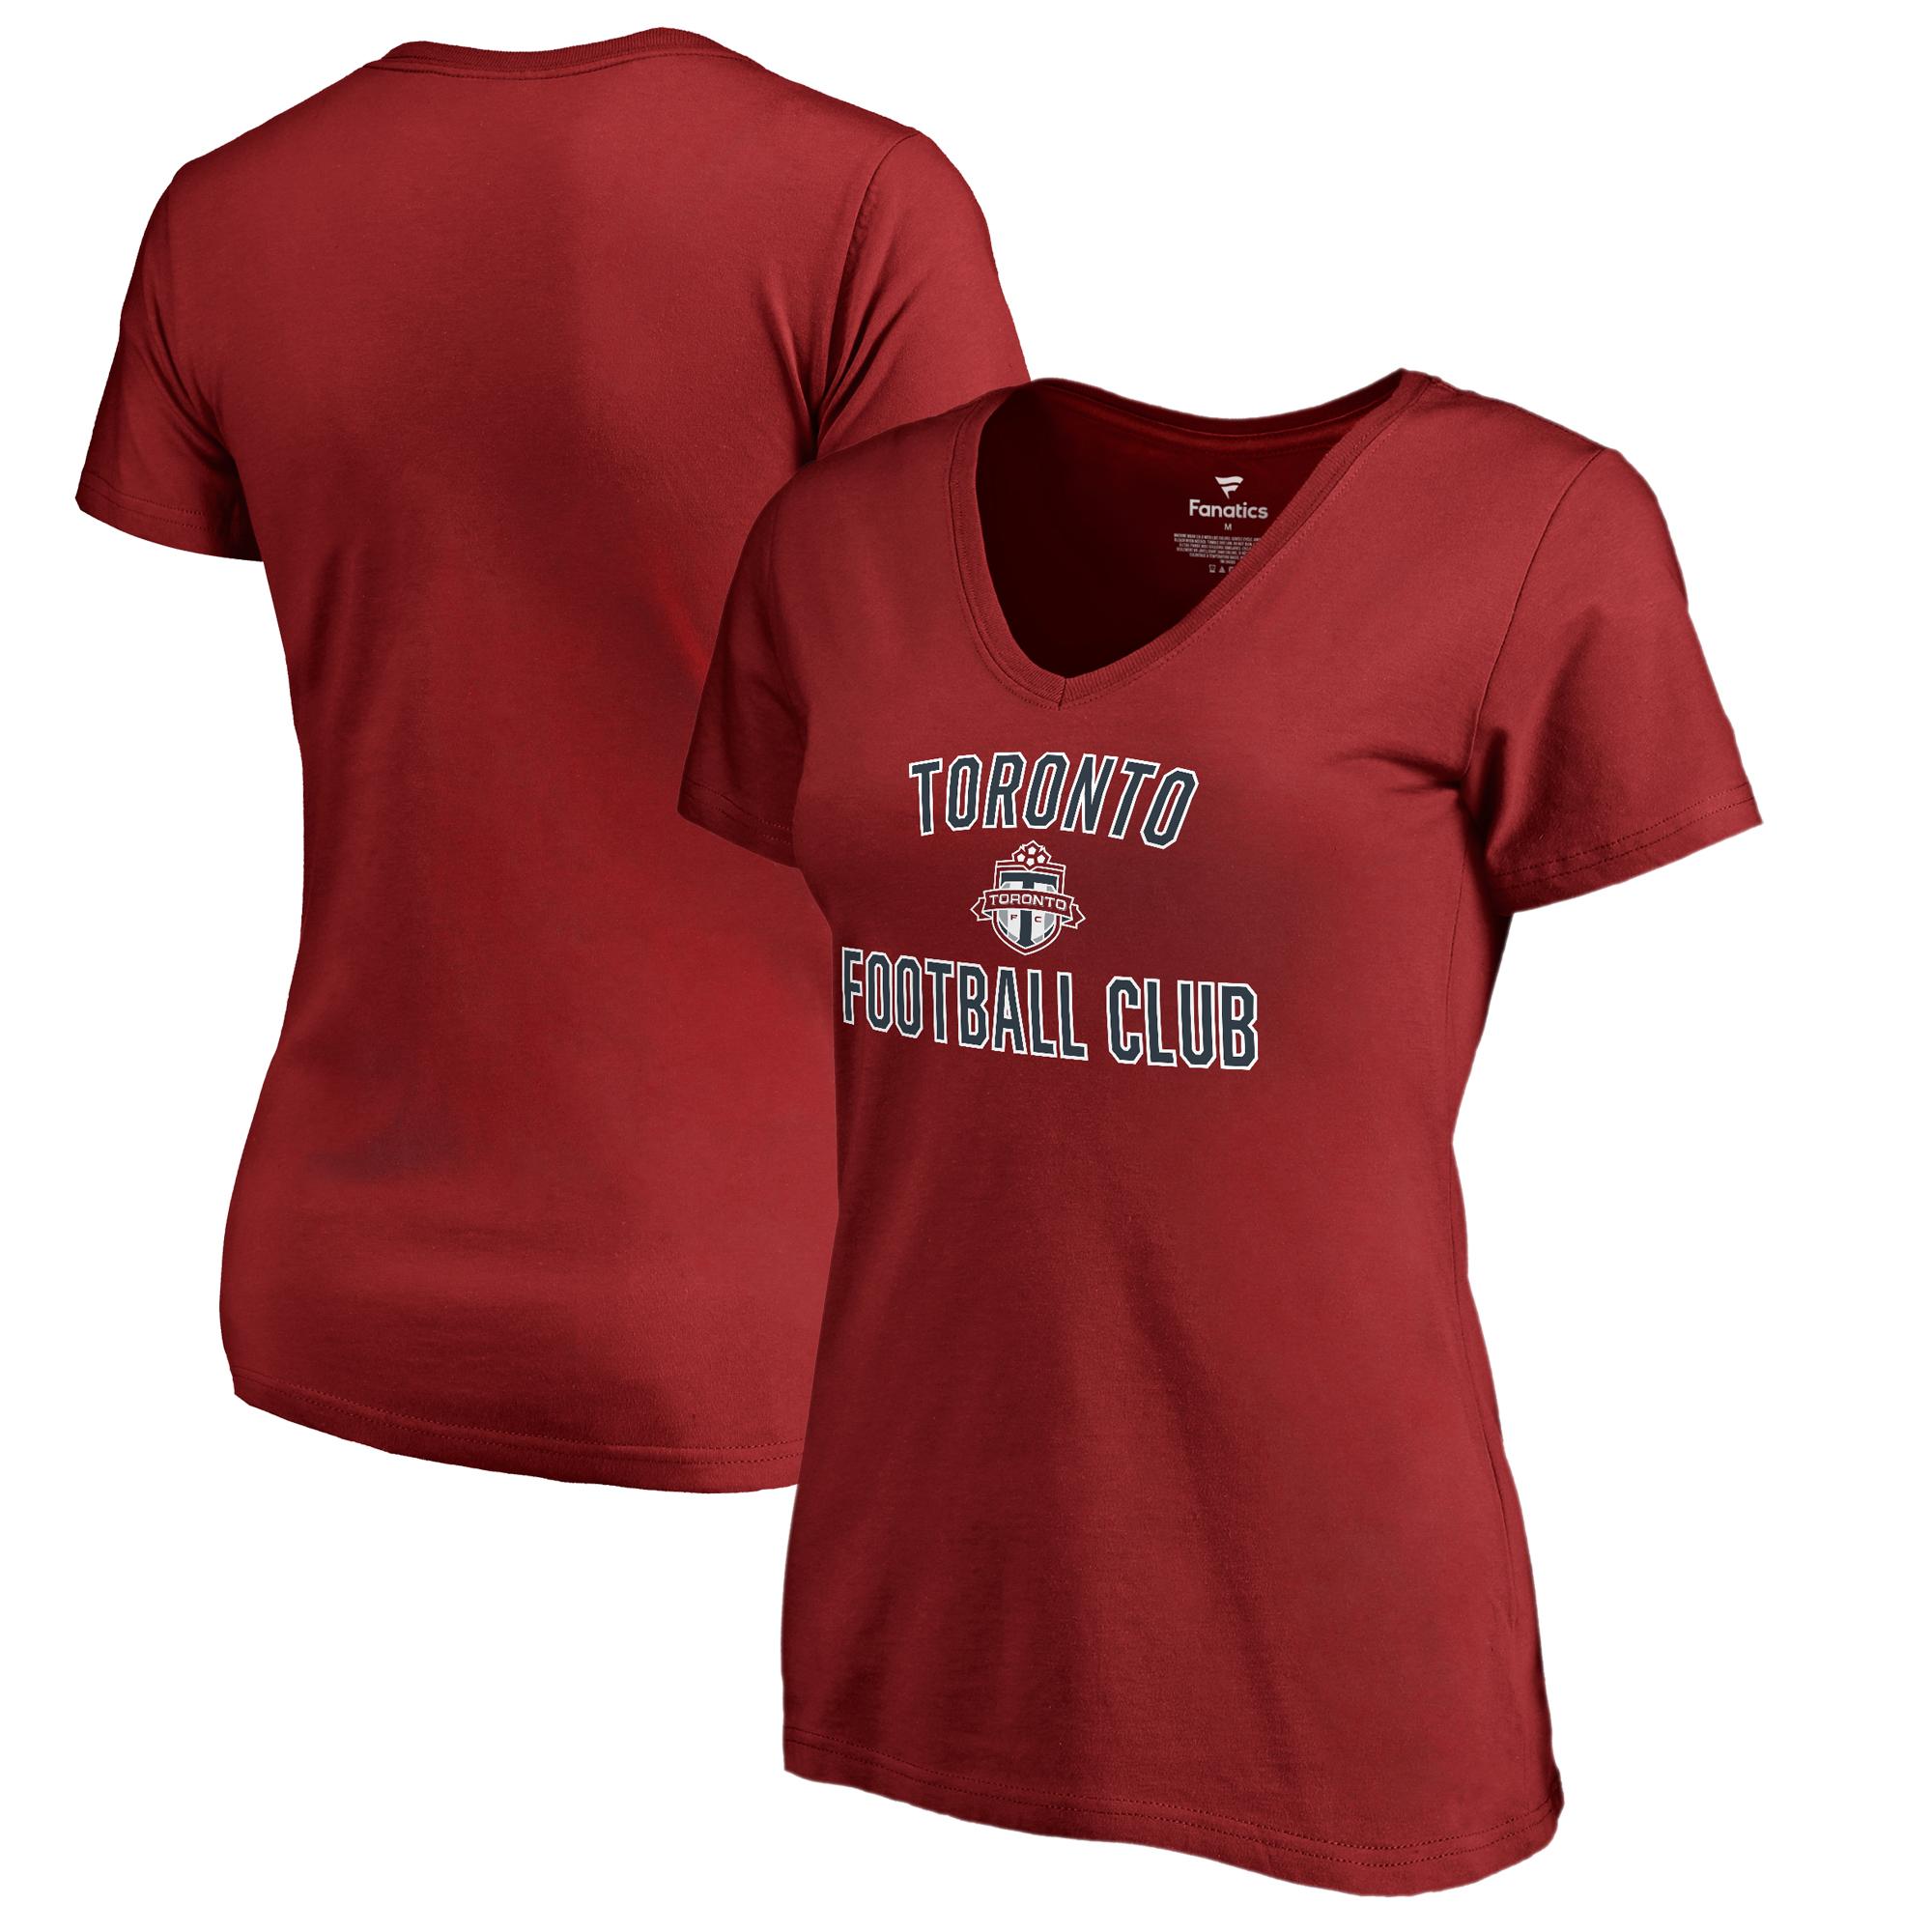 Toronto FC Fanatics Branded Women's Victory Arch V-Neck T-Shirt - Red